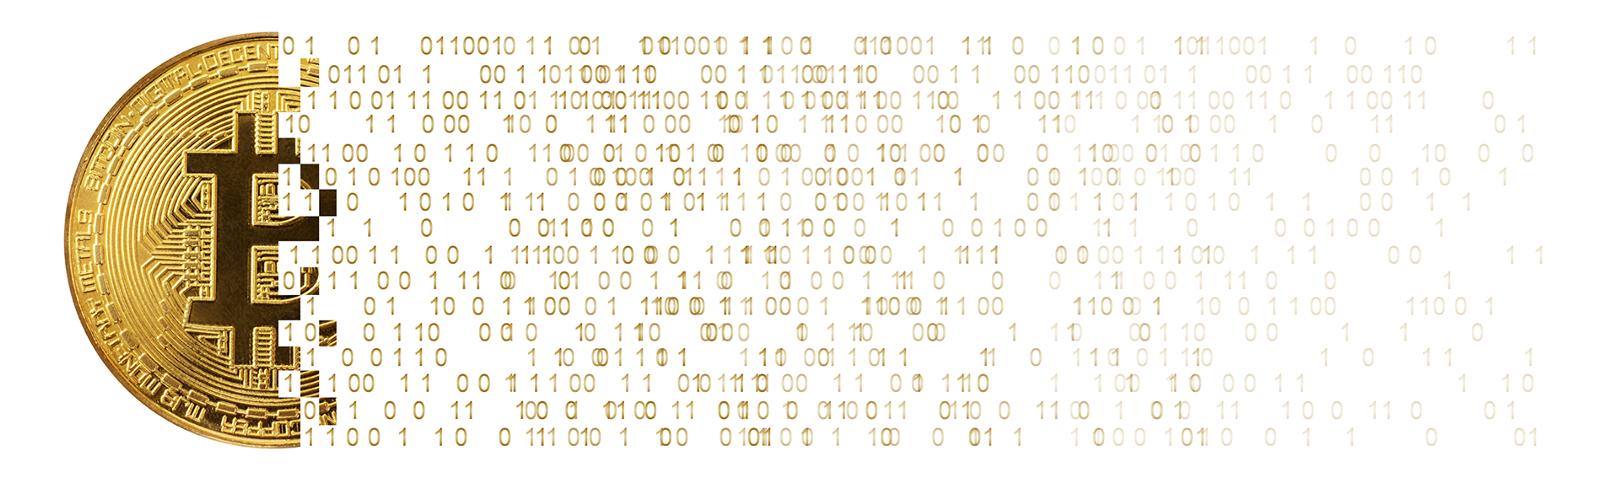 /bitcoin-is-money-e559d9885a1 feature image